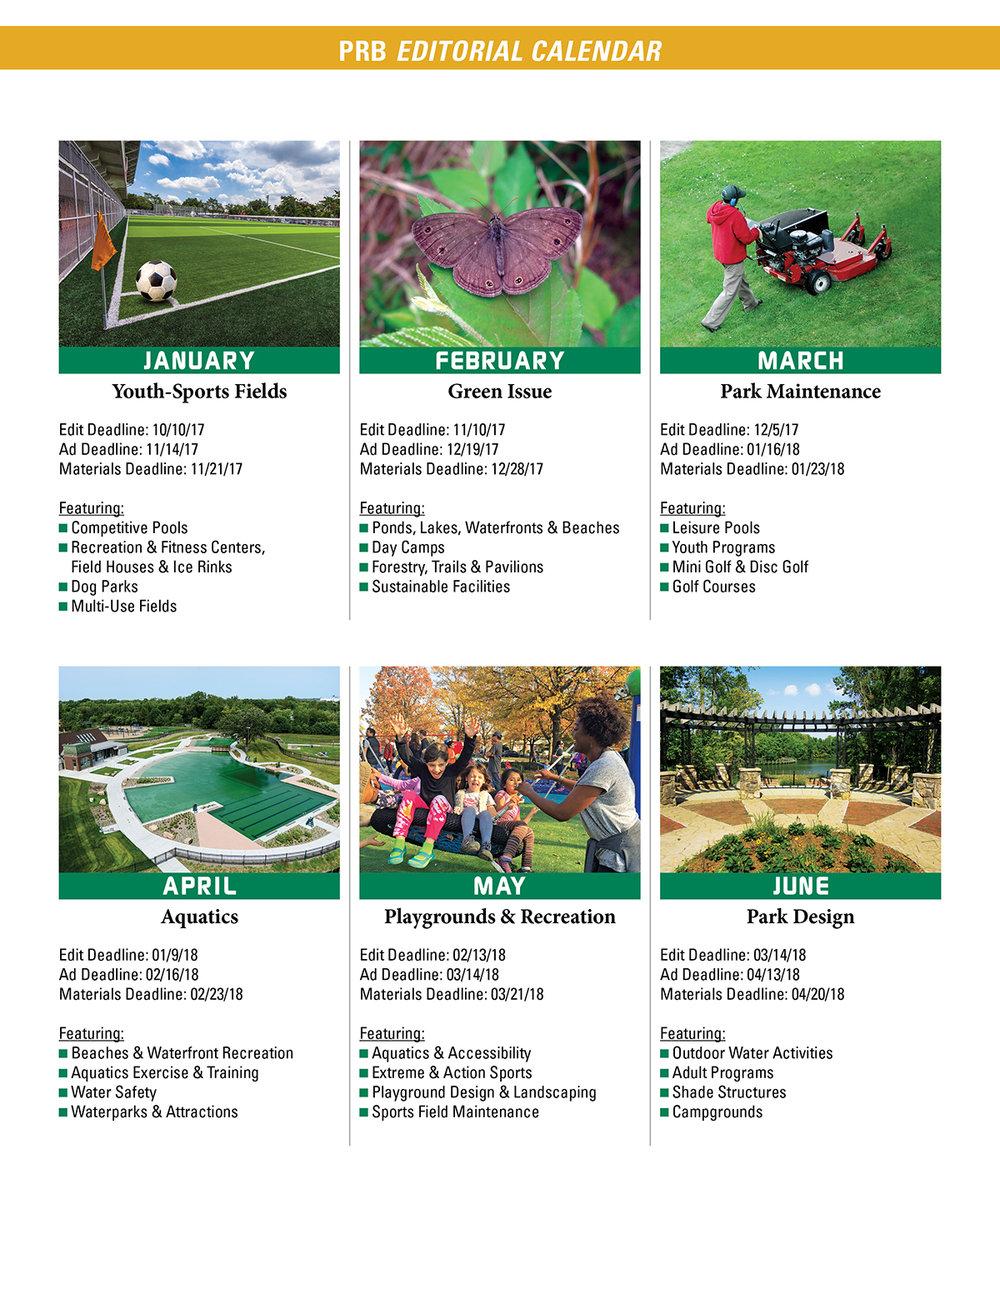 Editorial Calendar - page 1.jpg